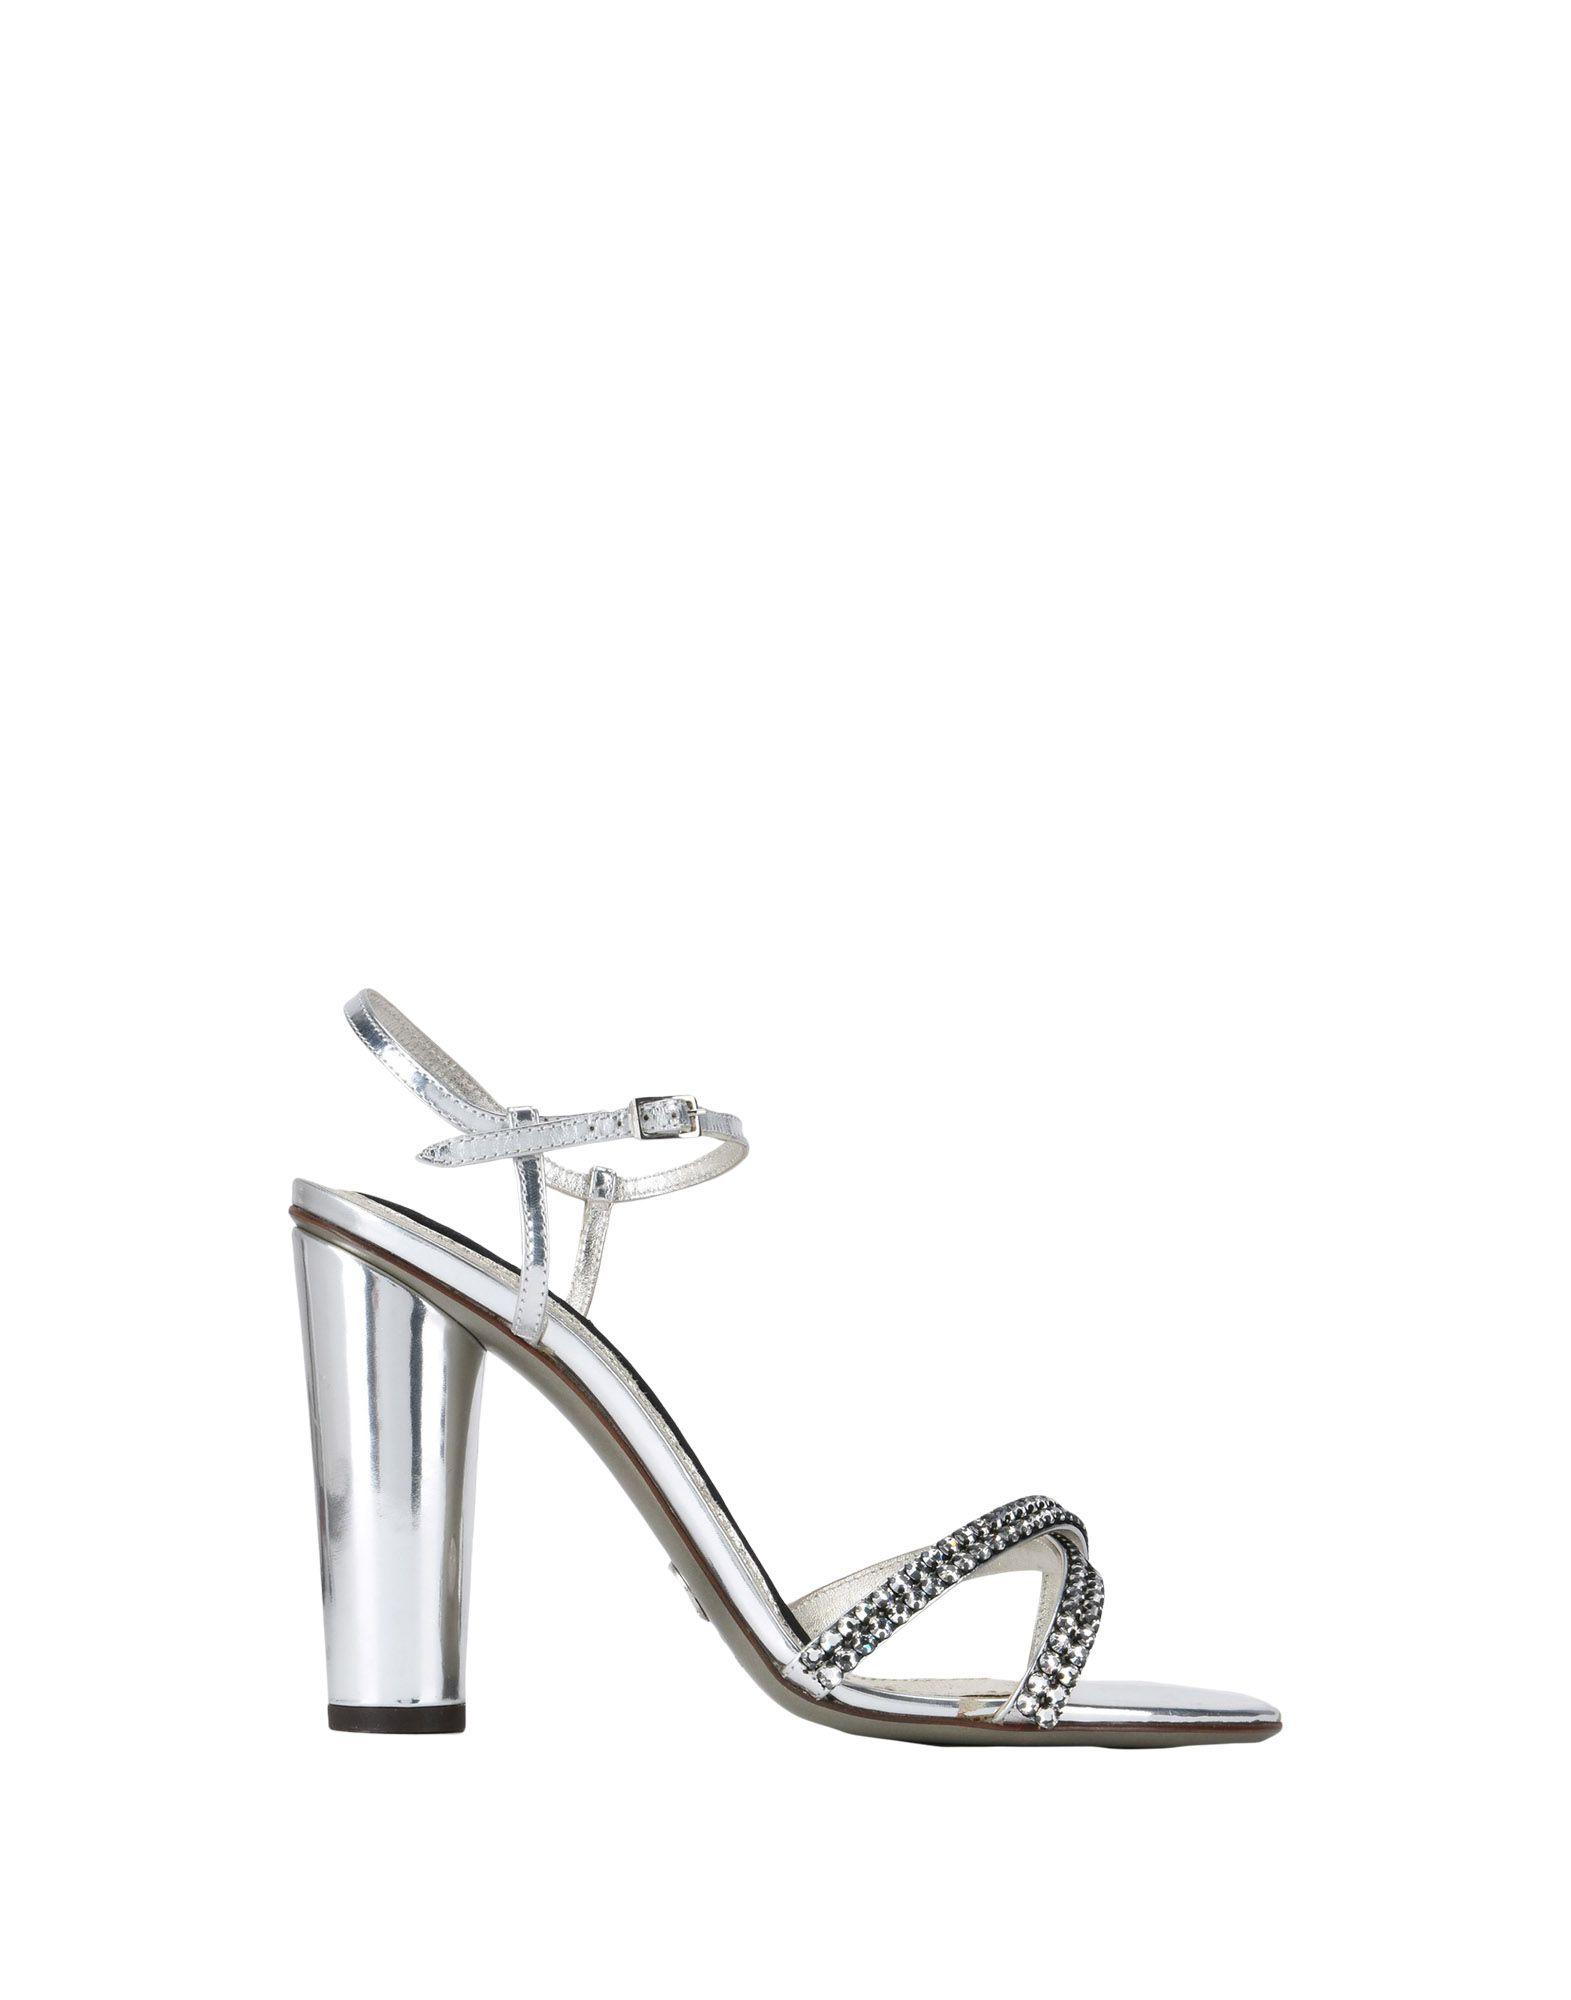 Dolce & Gabbana Neue Sandalen Damen  11431646IE Neue Gabbana Schuhe 9ca8a0